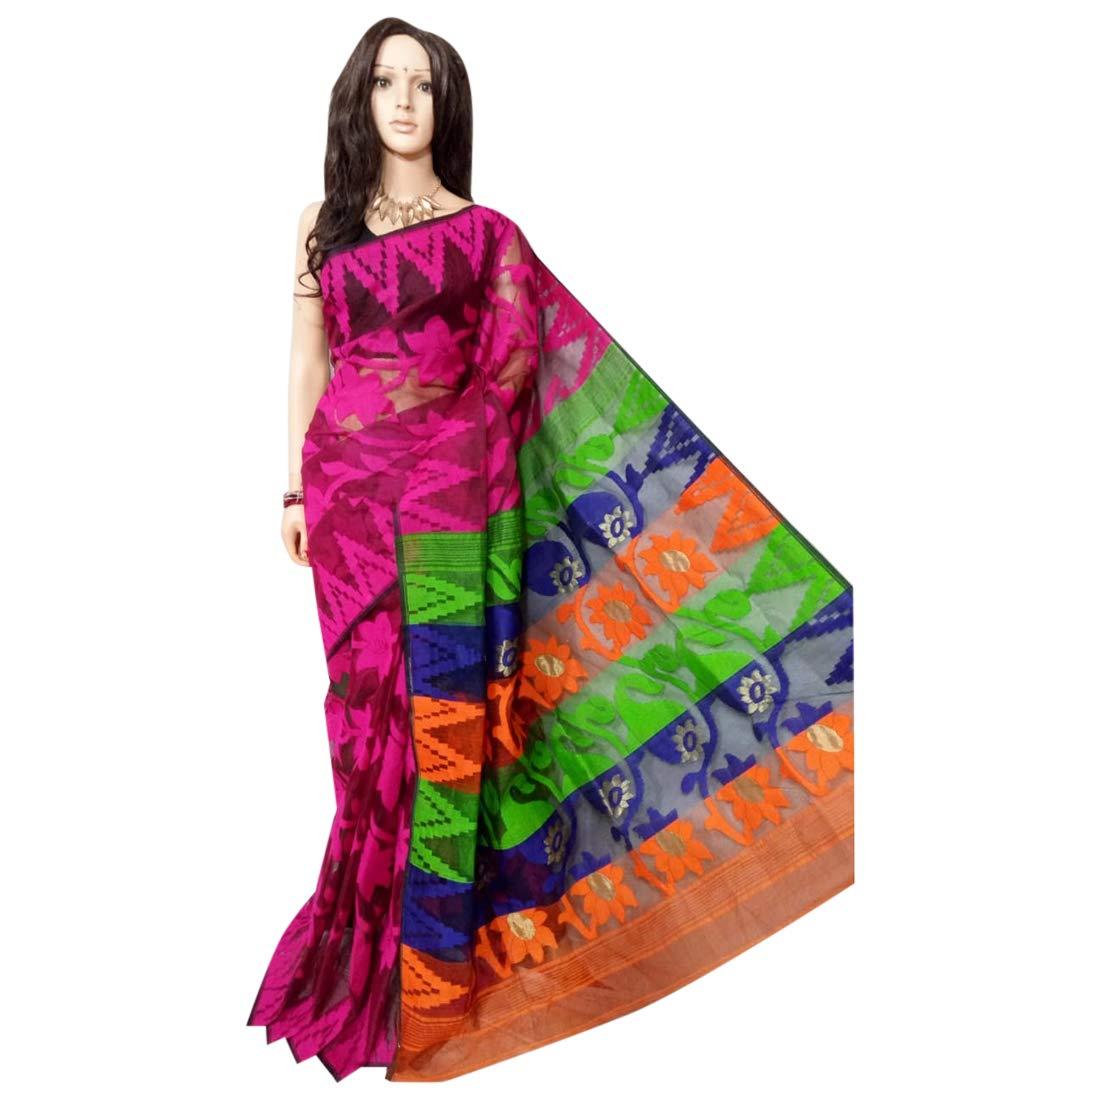 Indian Saree Ethnic Multicoloured dhakai jamdani Designer Collection Sari Party Formal Women Wear 104a